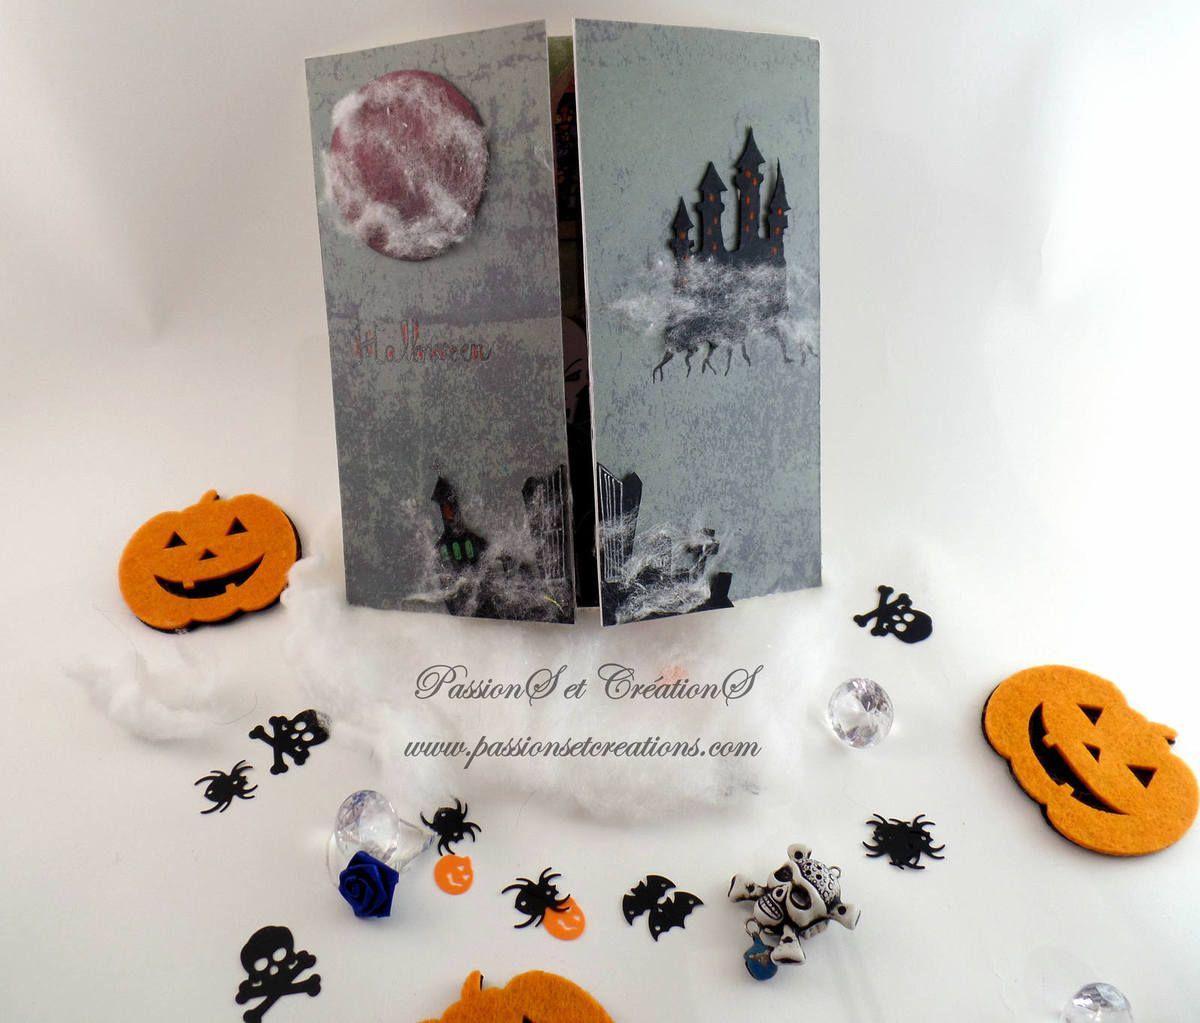 Carte - Halloween - 2017 - Portail - Chateau - Hantée - Lune - Rouge - Vampire - Bougie